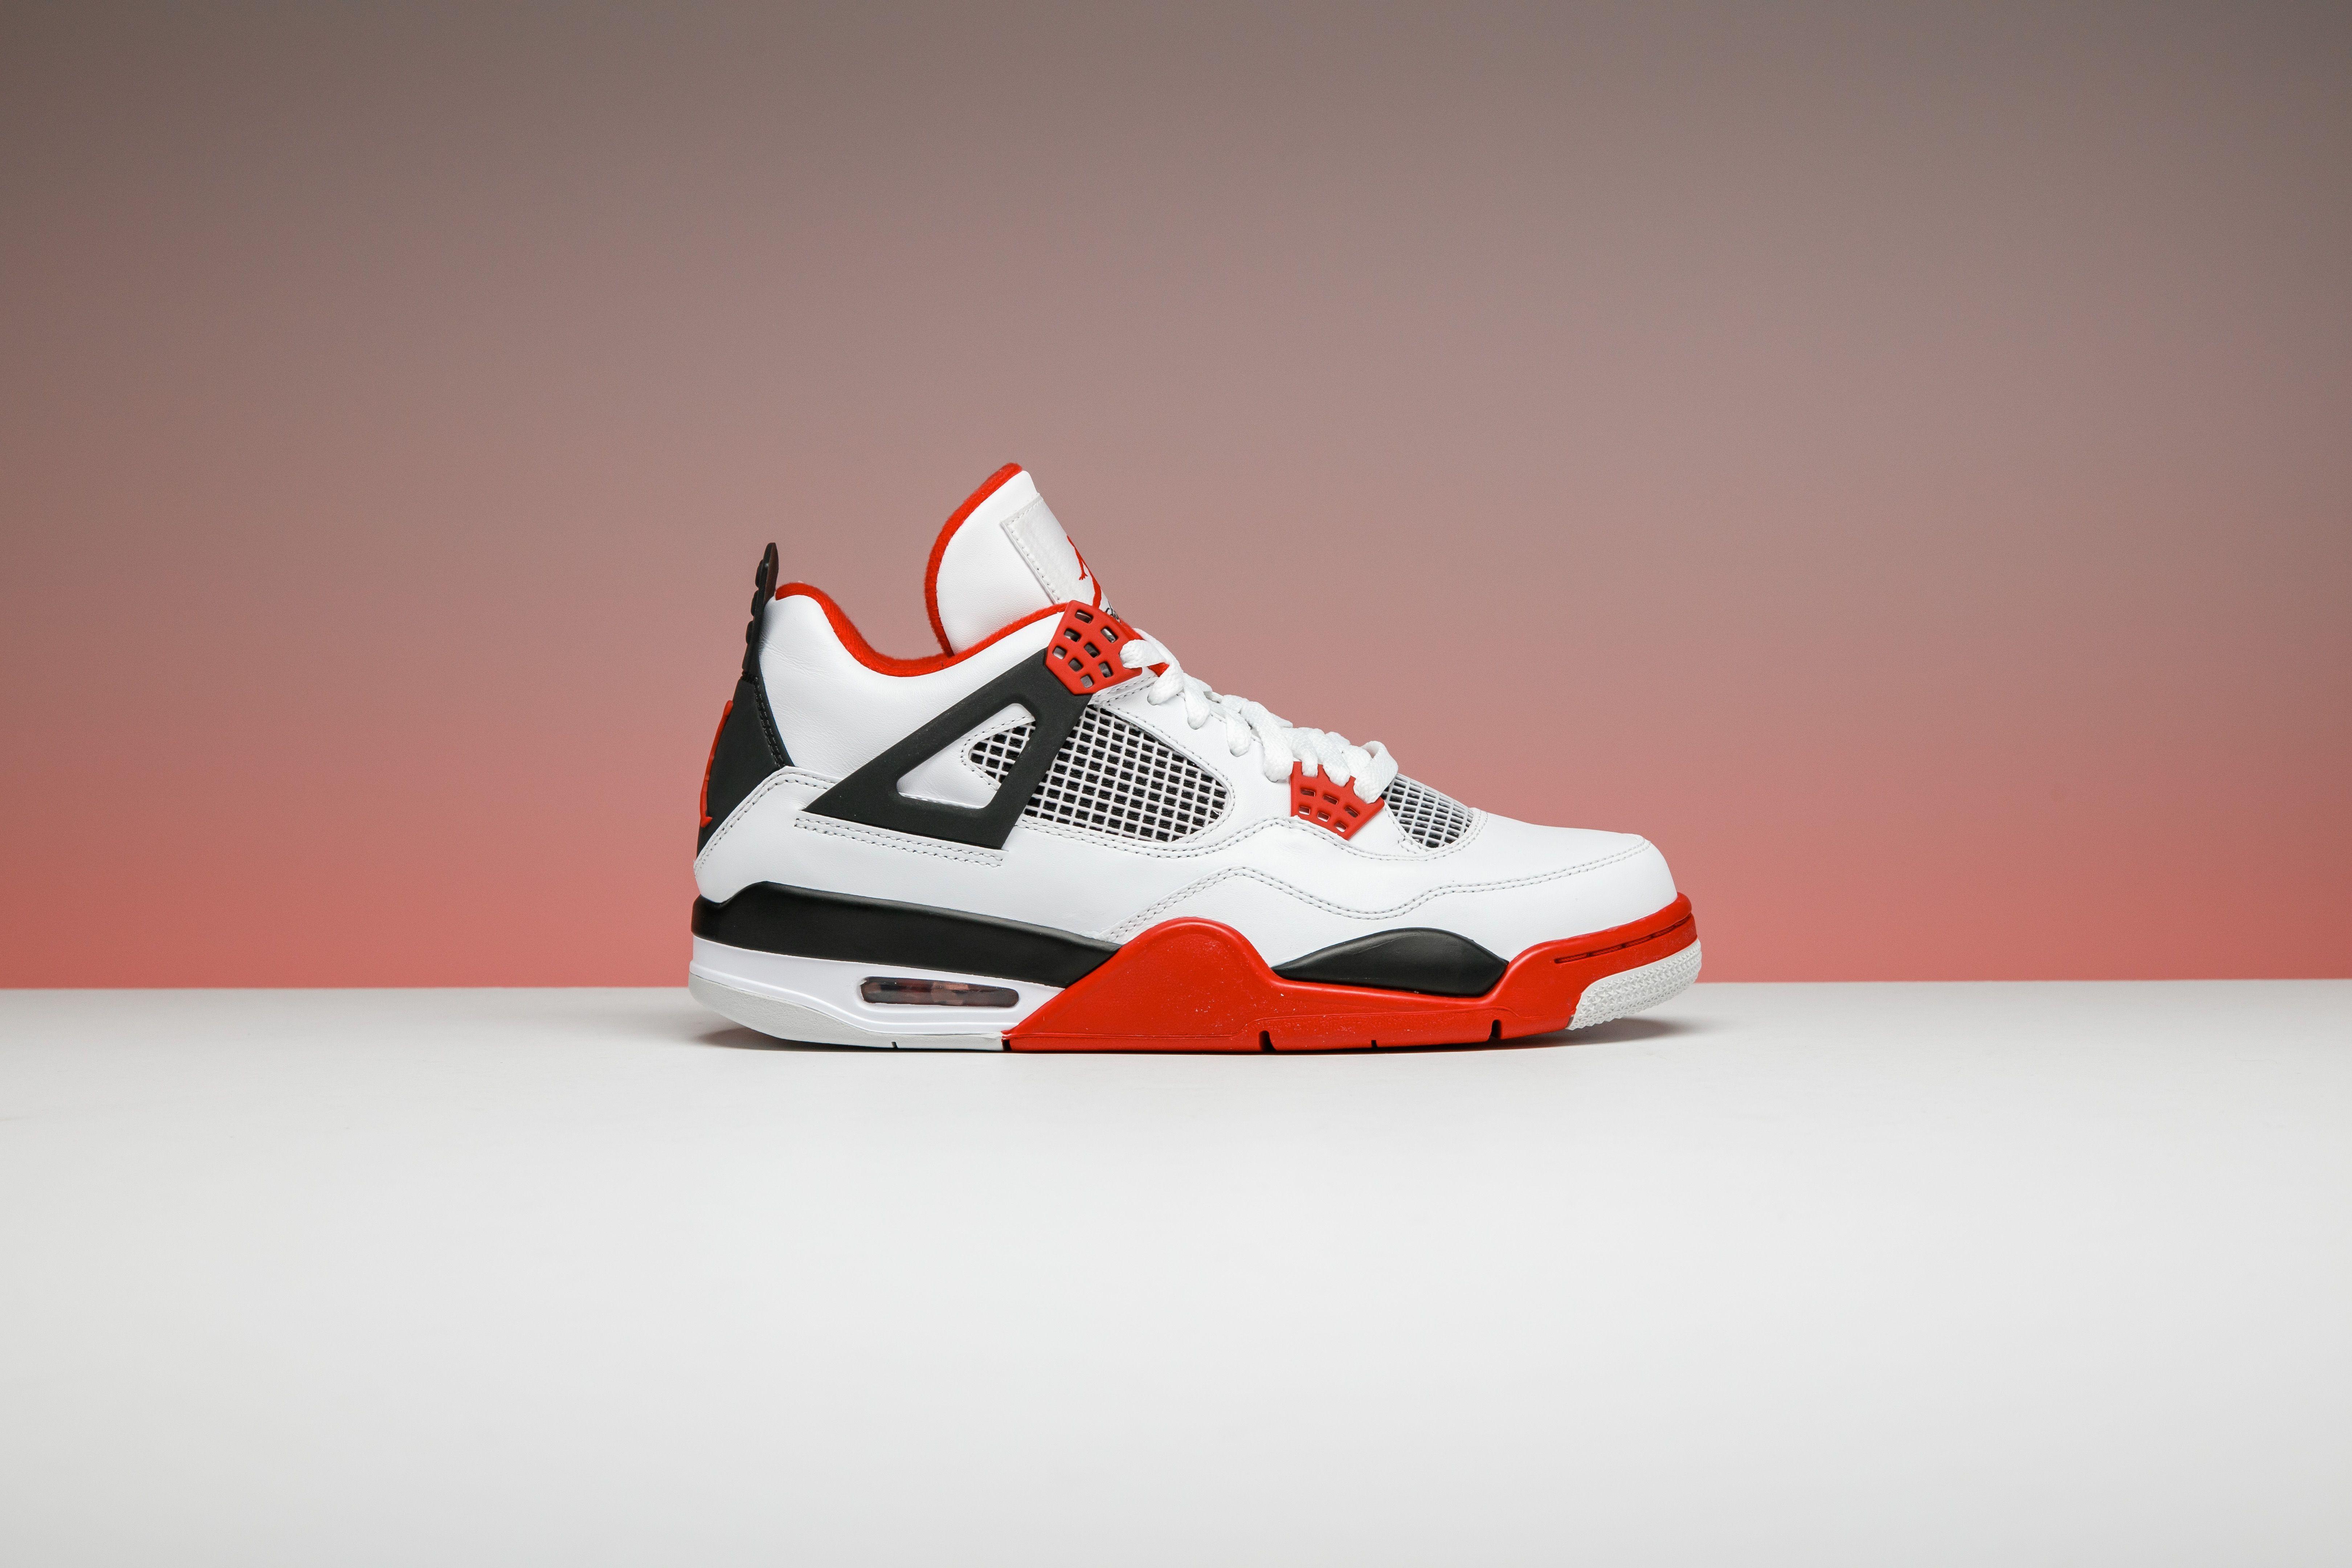 The Air Jordan 4 Took The World By Storm In 1989 Along With A Career Season Came A Career Sneaker Tinker Hatfie Air Jordans Nike Shoes Roshe Air Jordans Retro